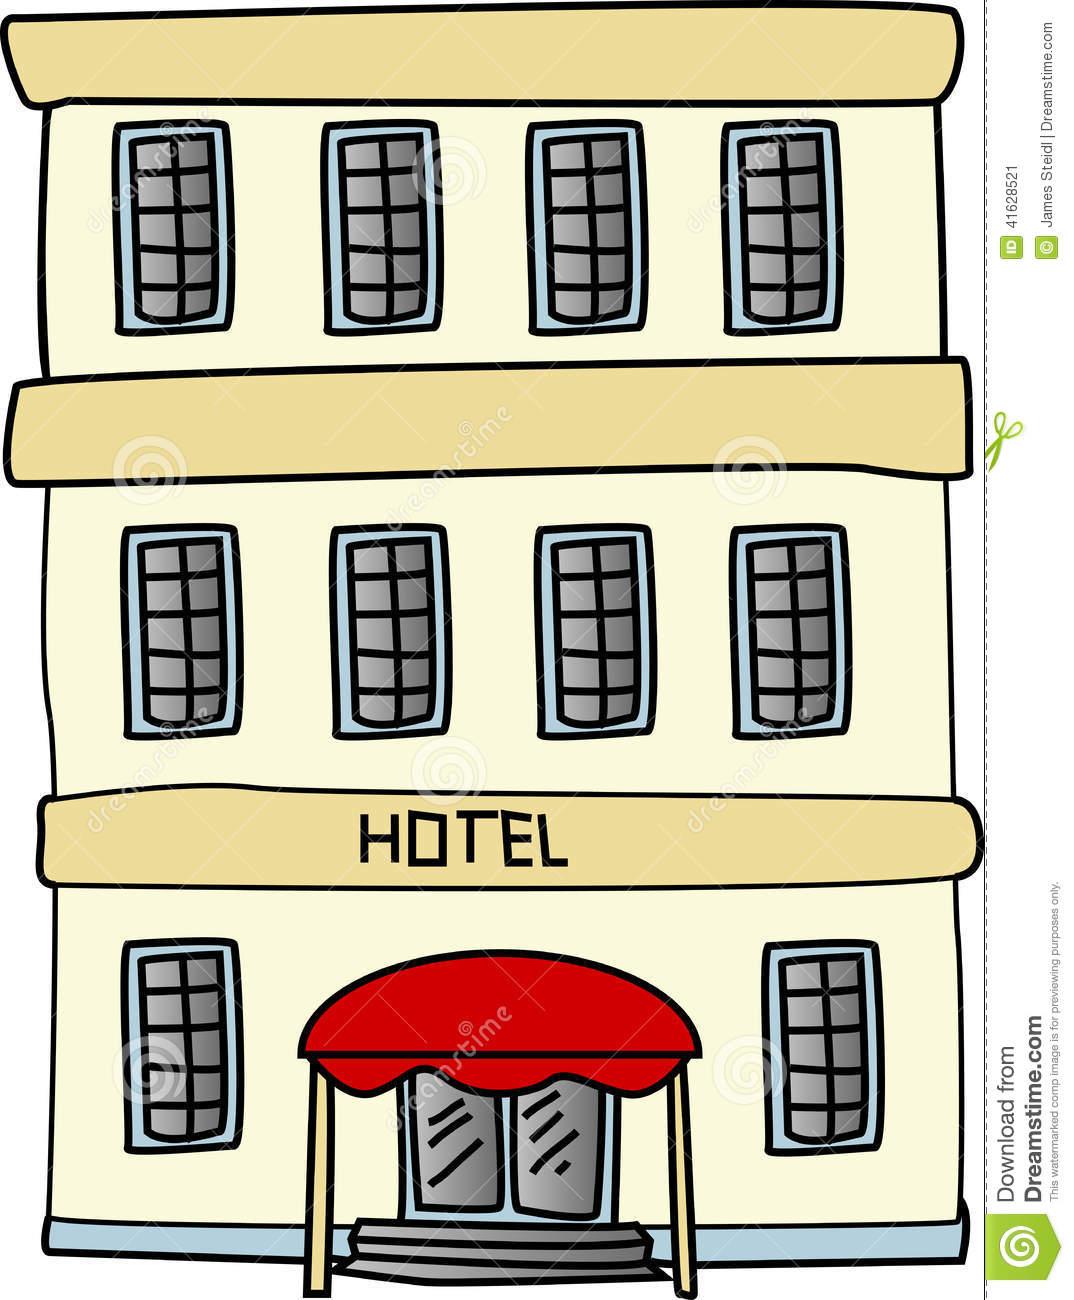 Hotel clipart. Clip art free panda